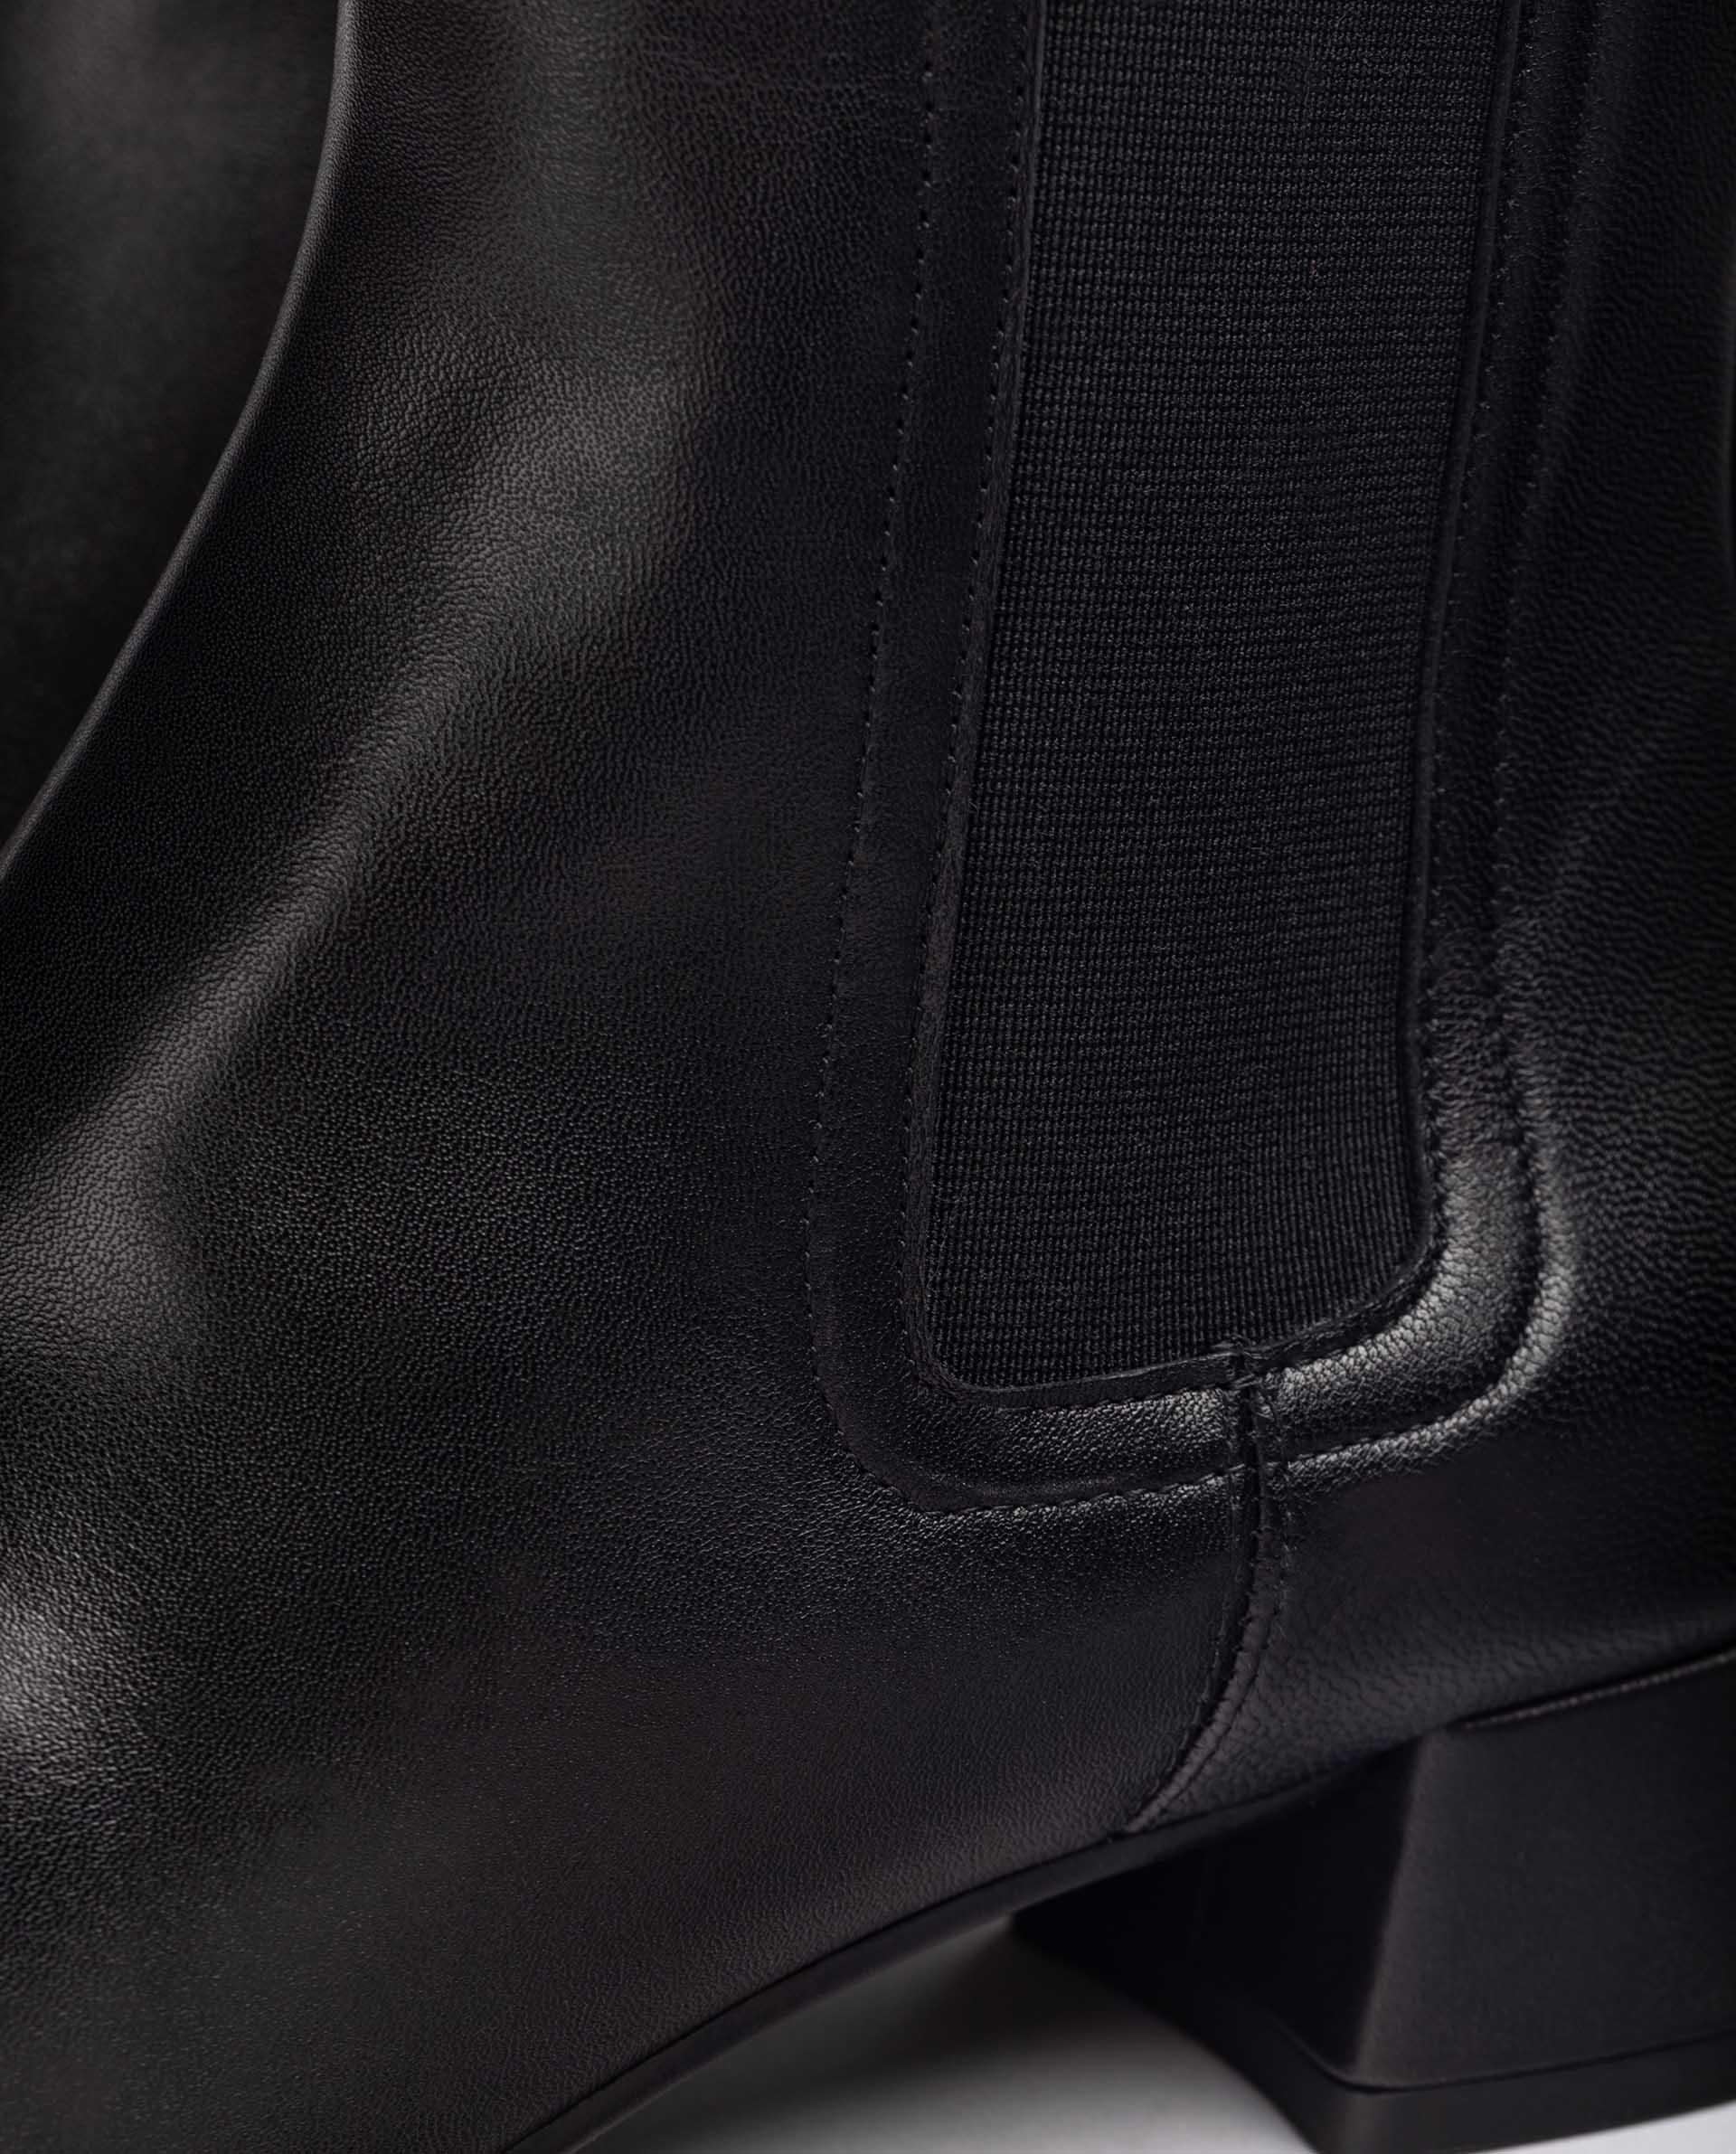 Unisa Ankle boots GUSO_VU black